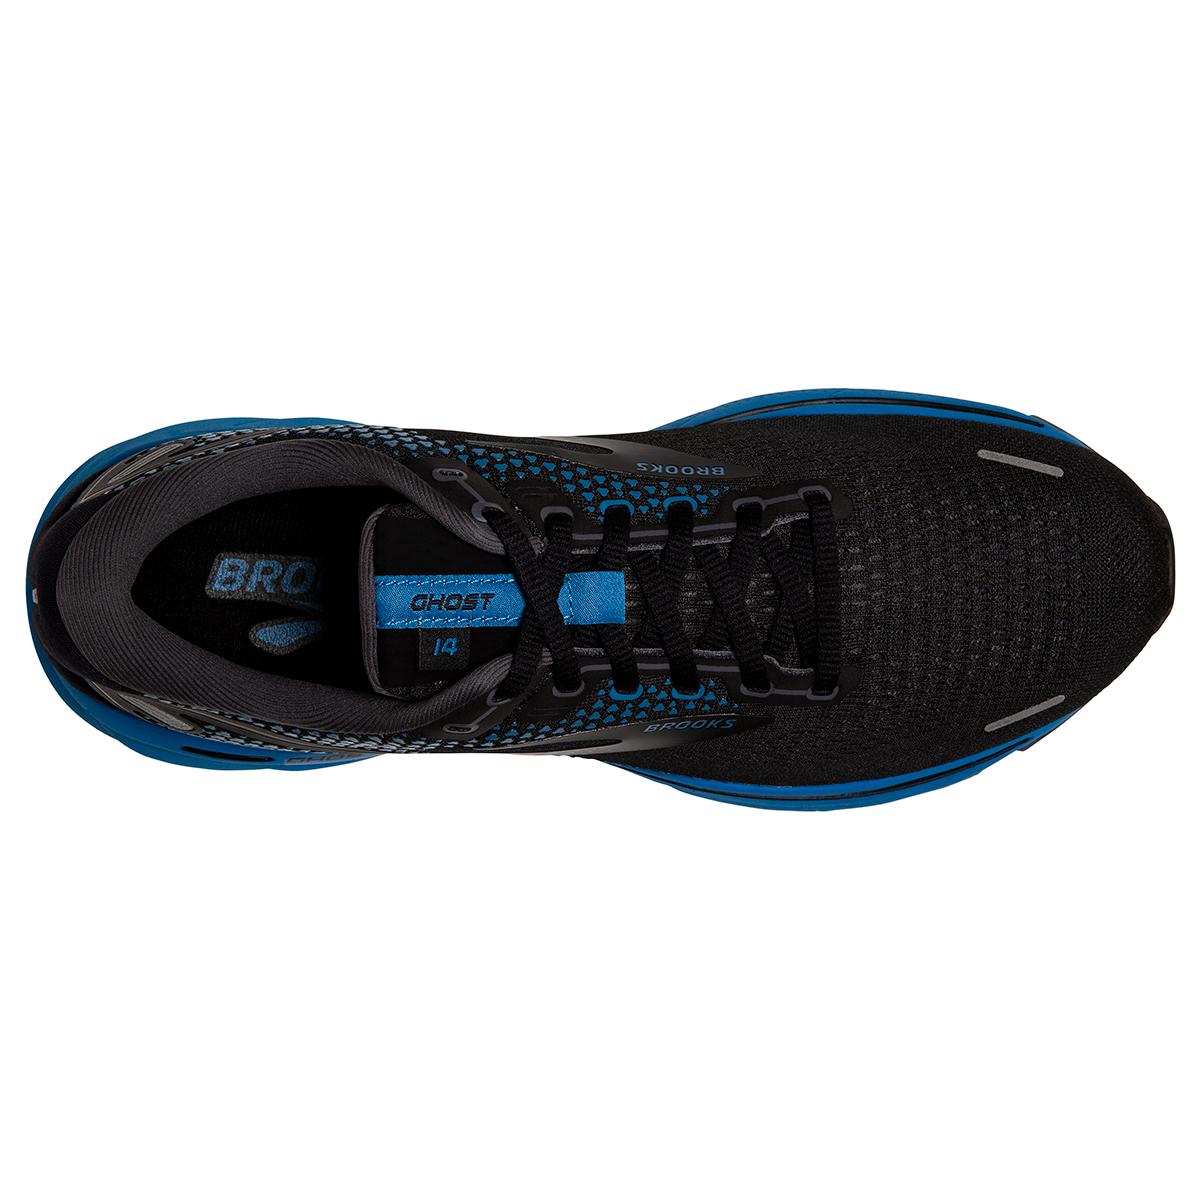 Men's Brooks Ghost 14 Running Shoe - Color: Black/Blackened - Size: 7 - Width: Regular, Black/Blackened, large, image 3